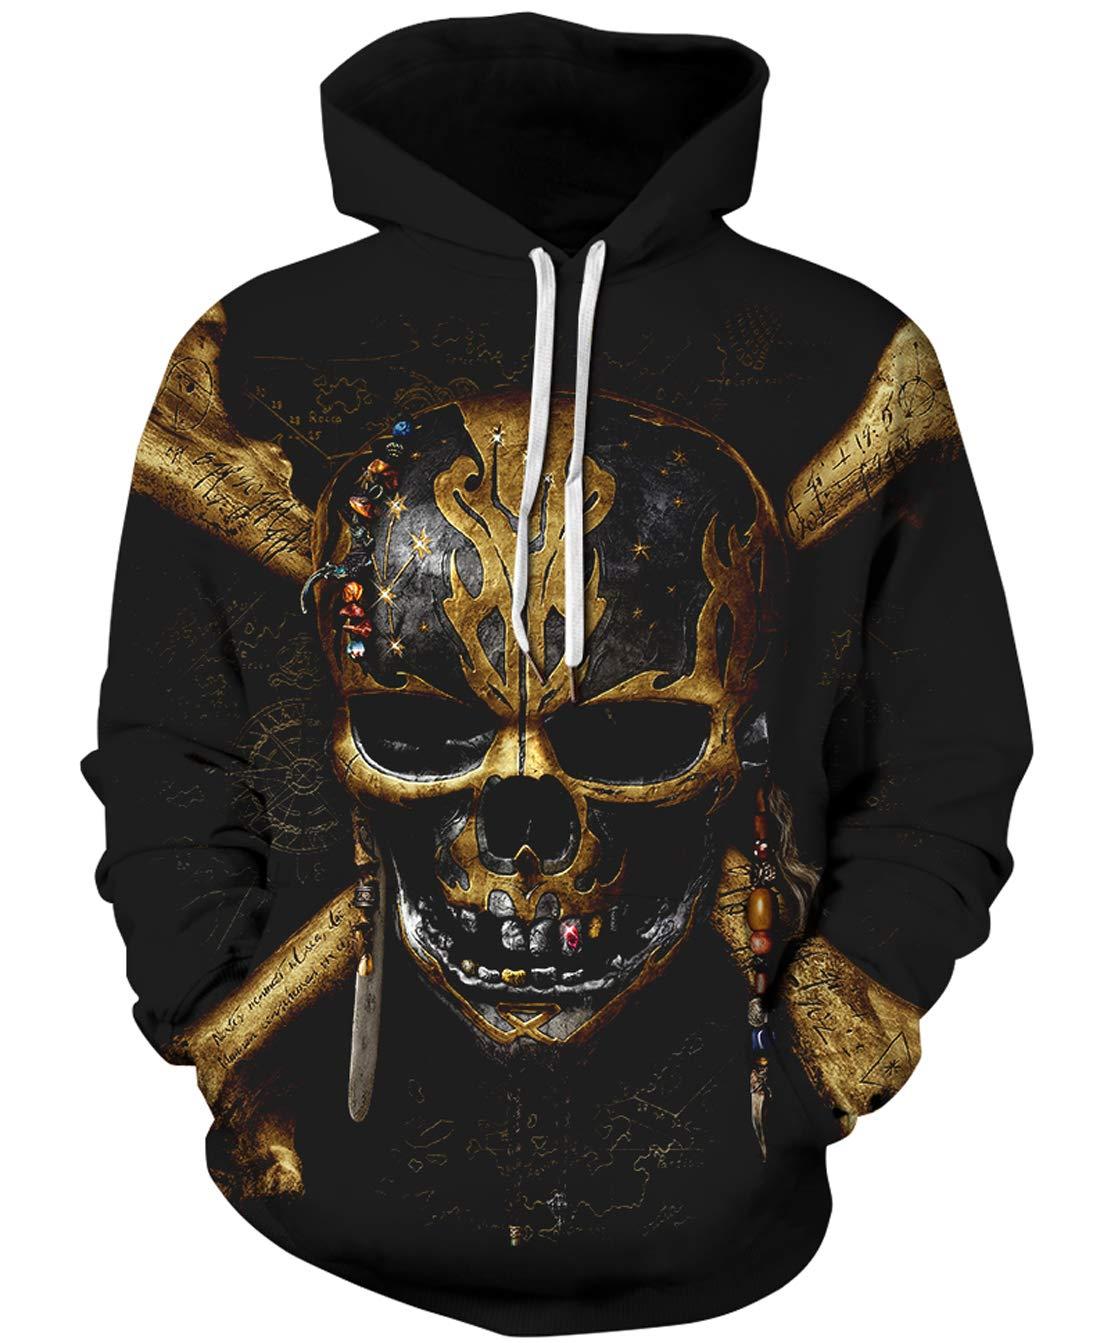 URVIP Unisex Realistic 3D Print Pullover Sweatshirt Hoodies with Big Pockets QYDM-467 XXL/XXXL by URVIP